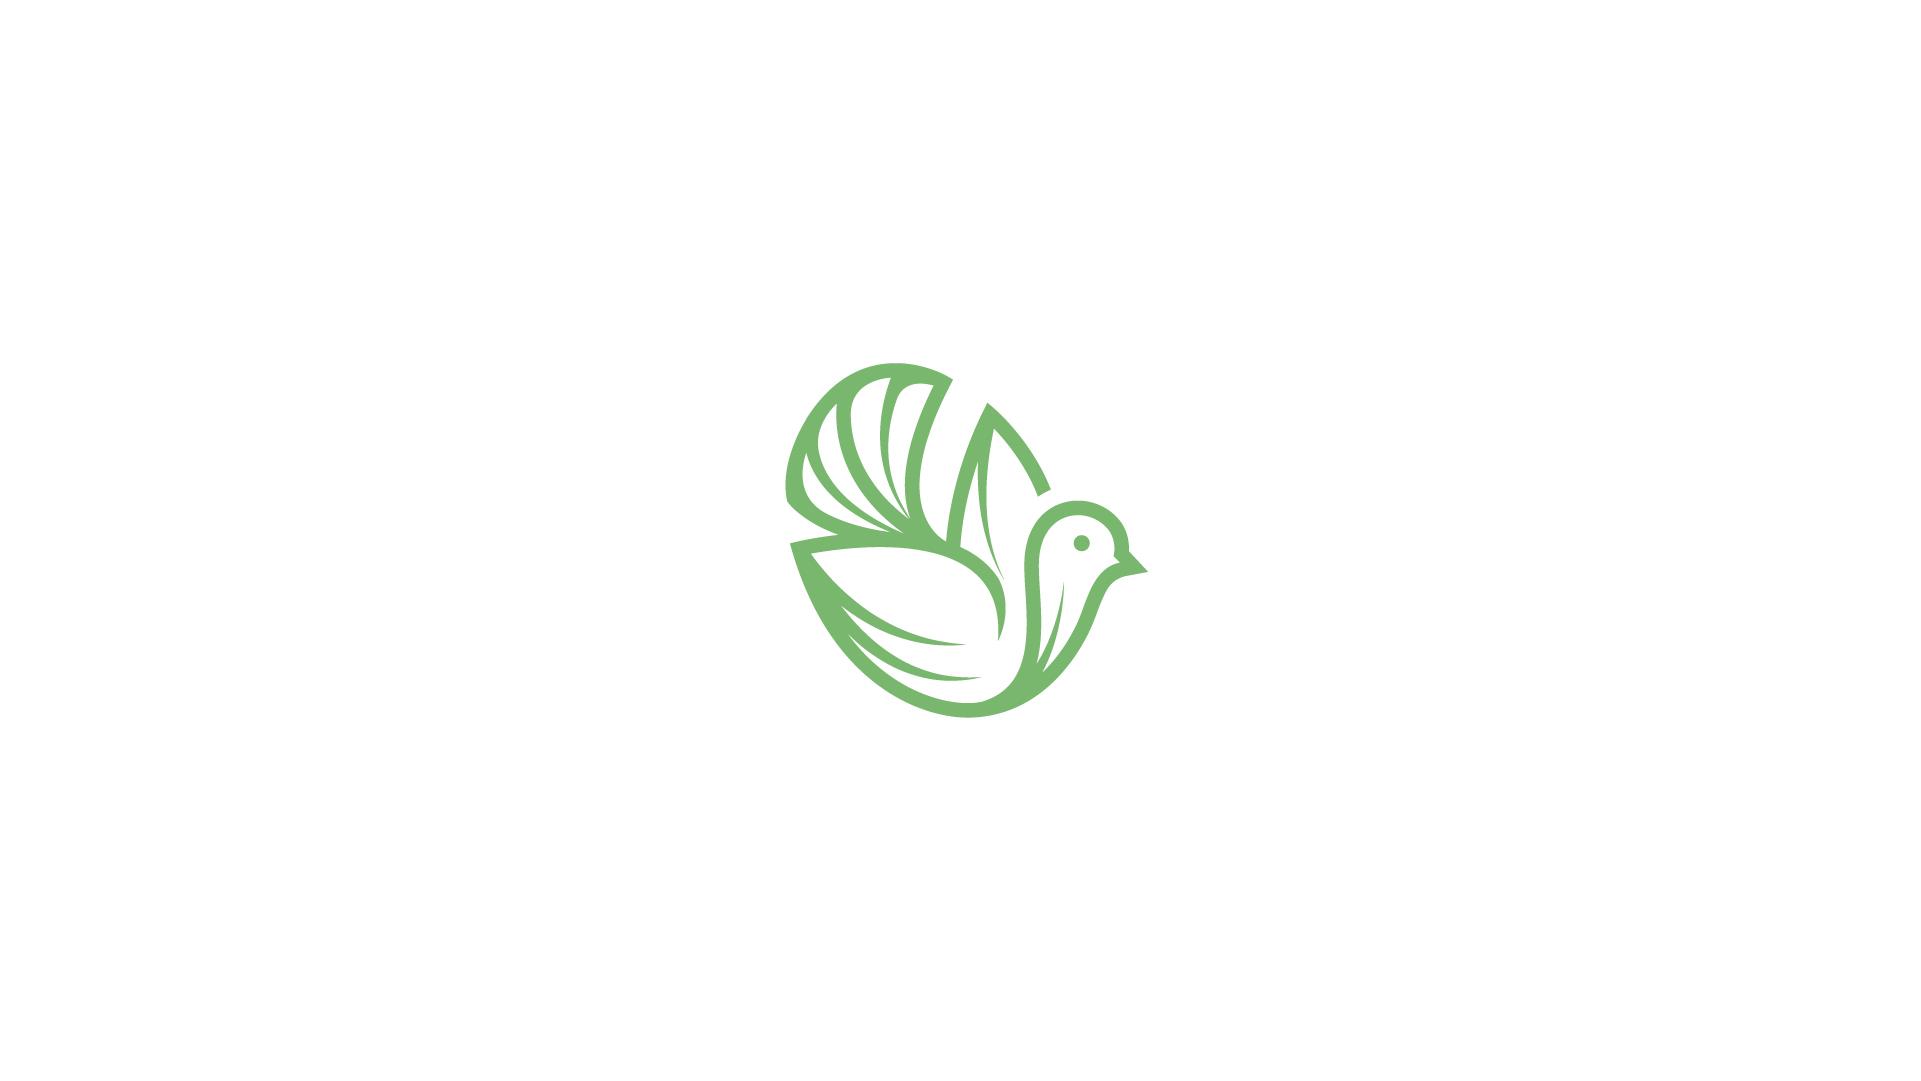 Bird-logo-design-logo-for-sale-dainogo